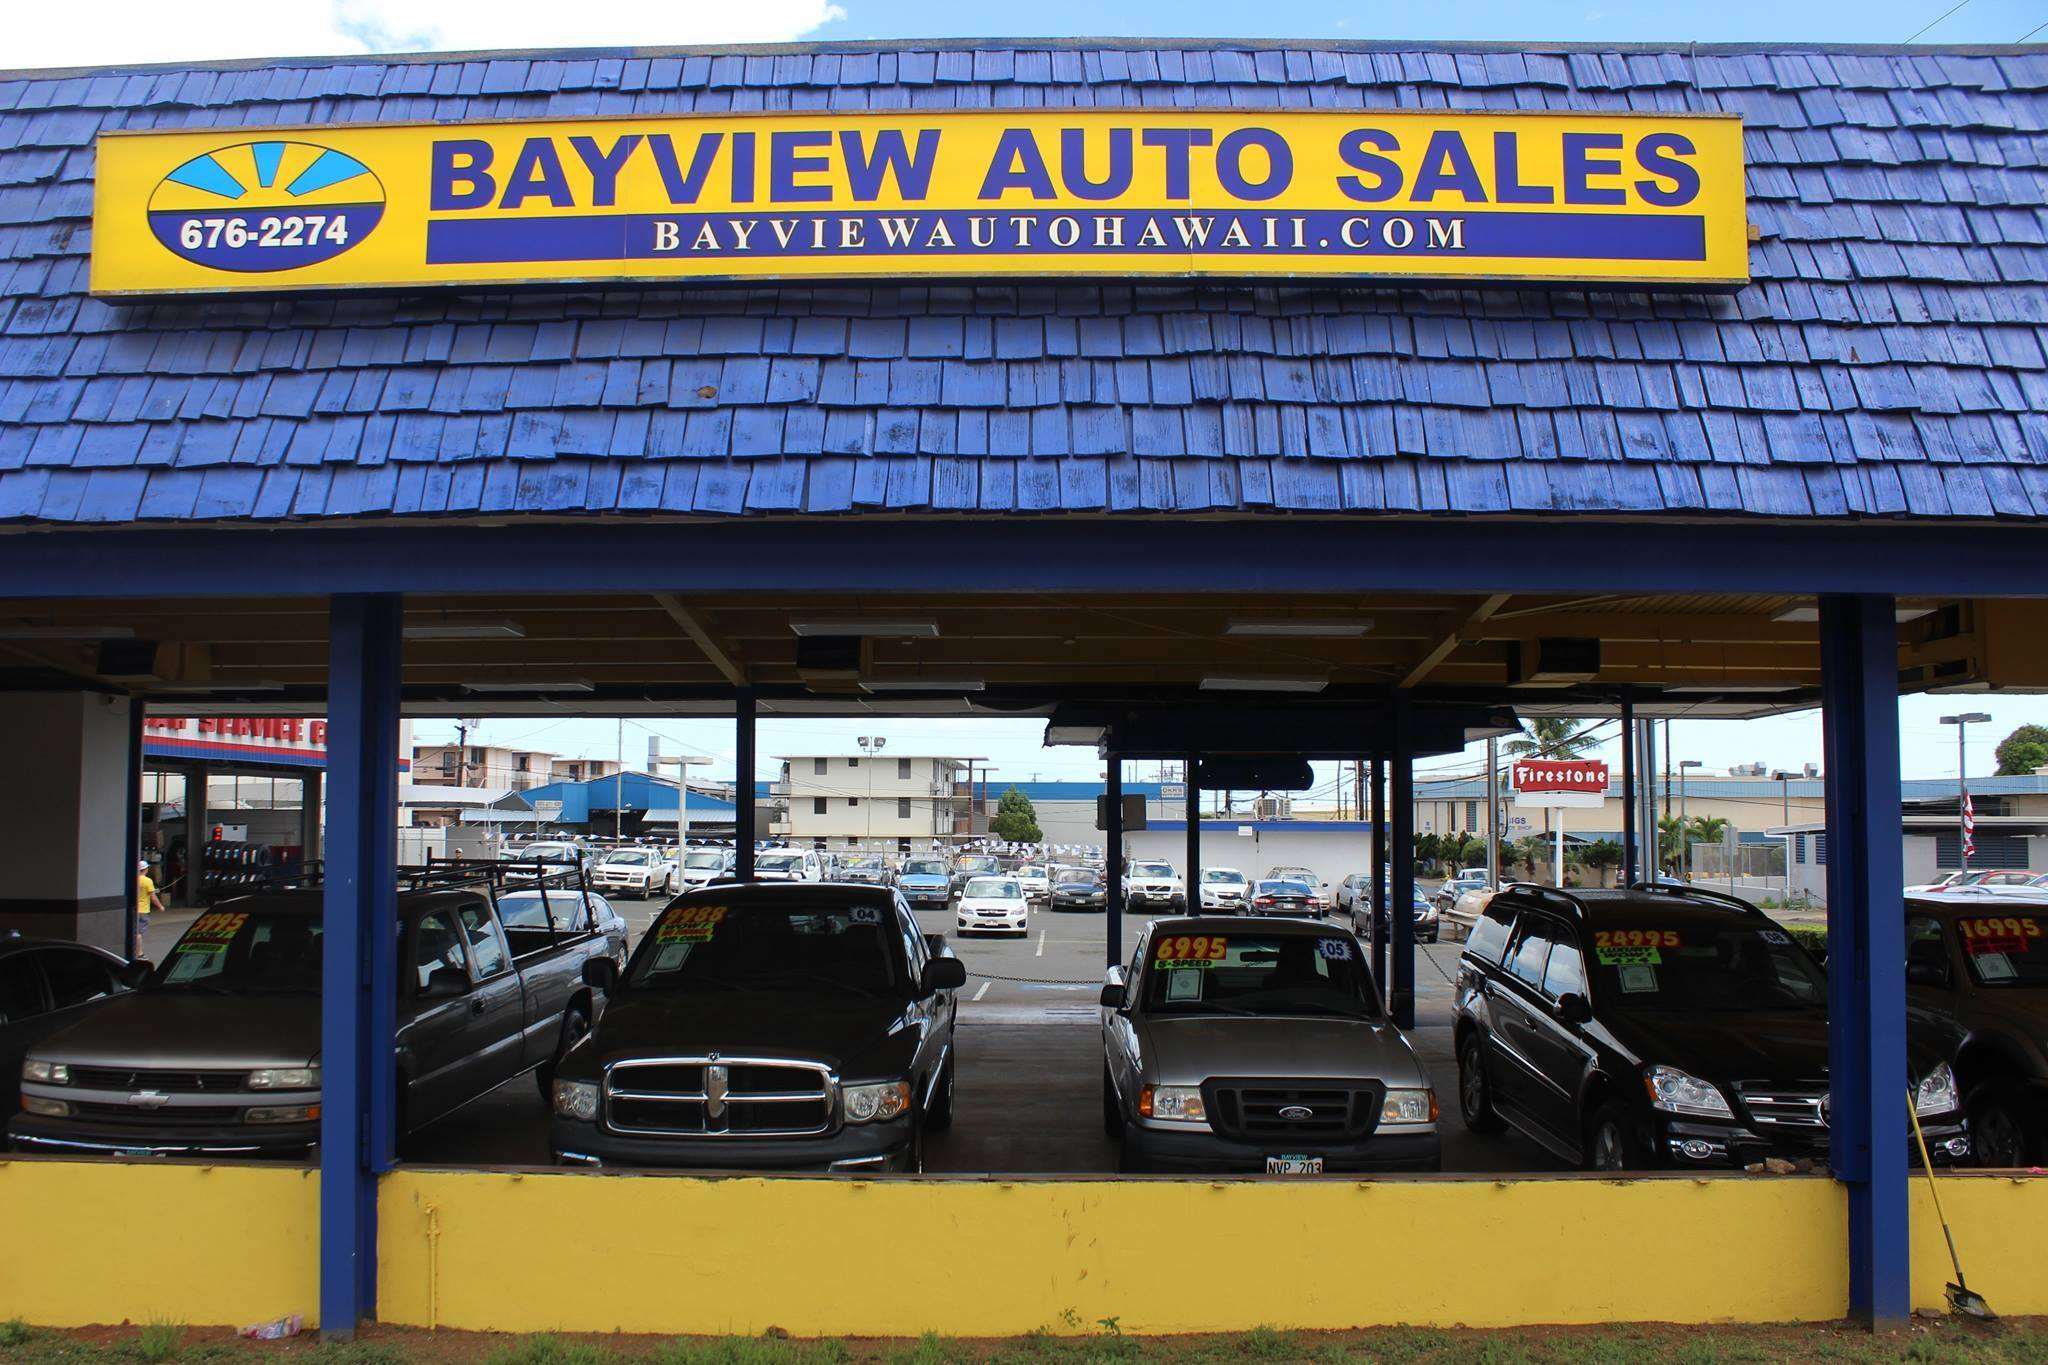 Bayview Auto Sales reviews   Car Dealers at 94-267 Farrington Hwy - Waipahu HI